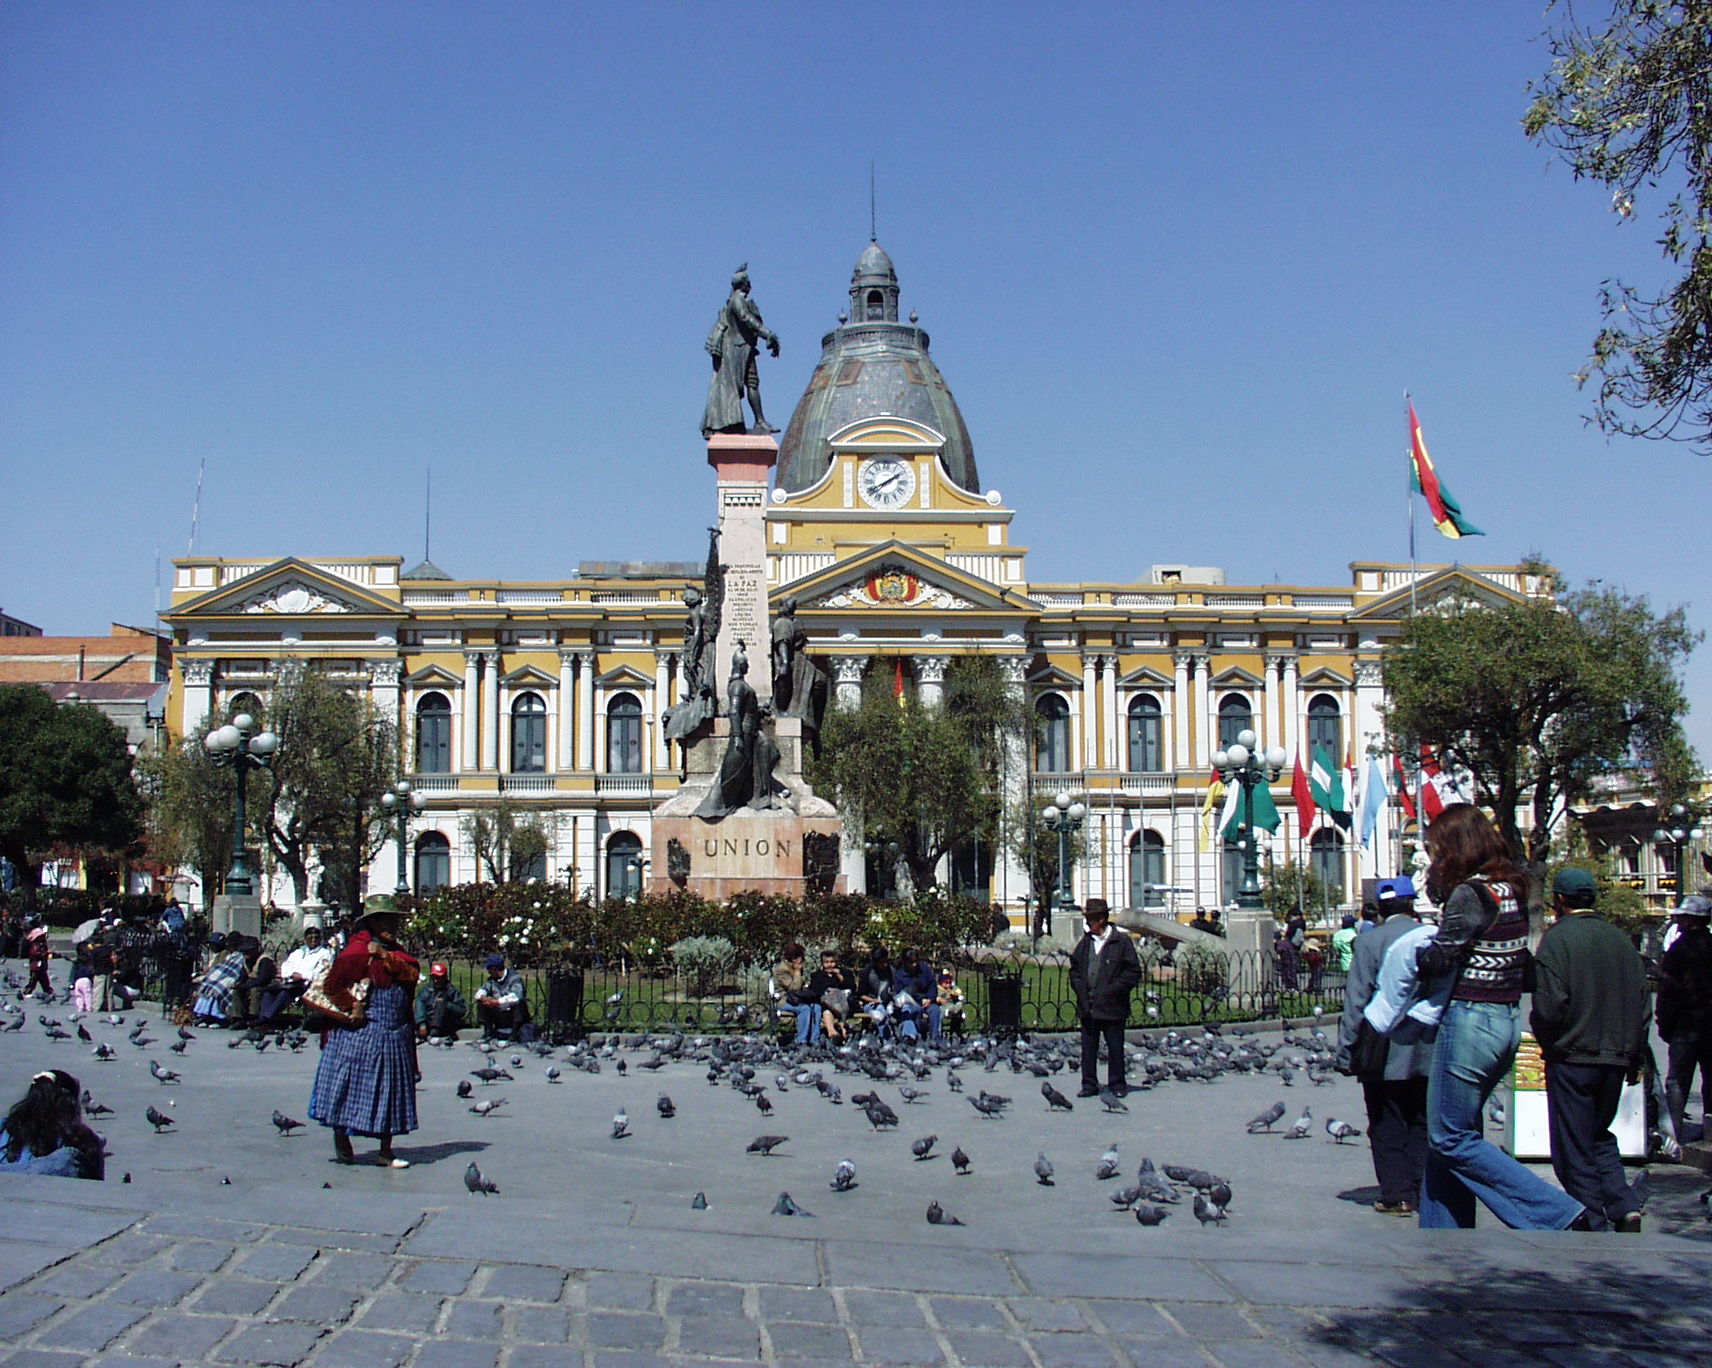 File:Palacio de Congresos Bolivia.jpg